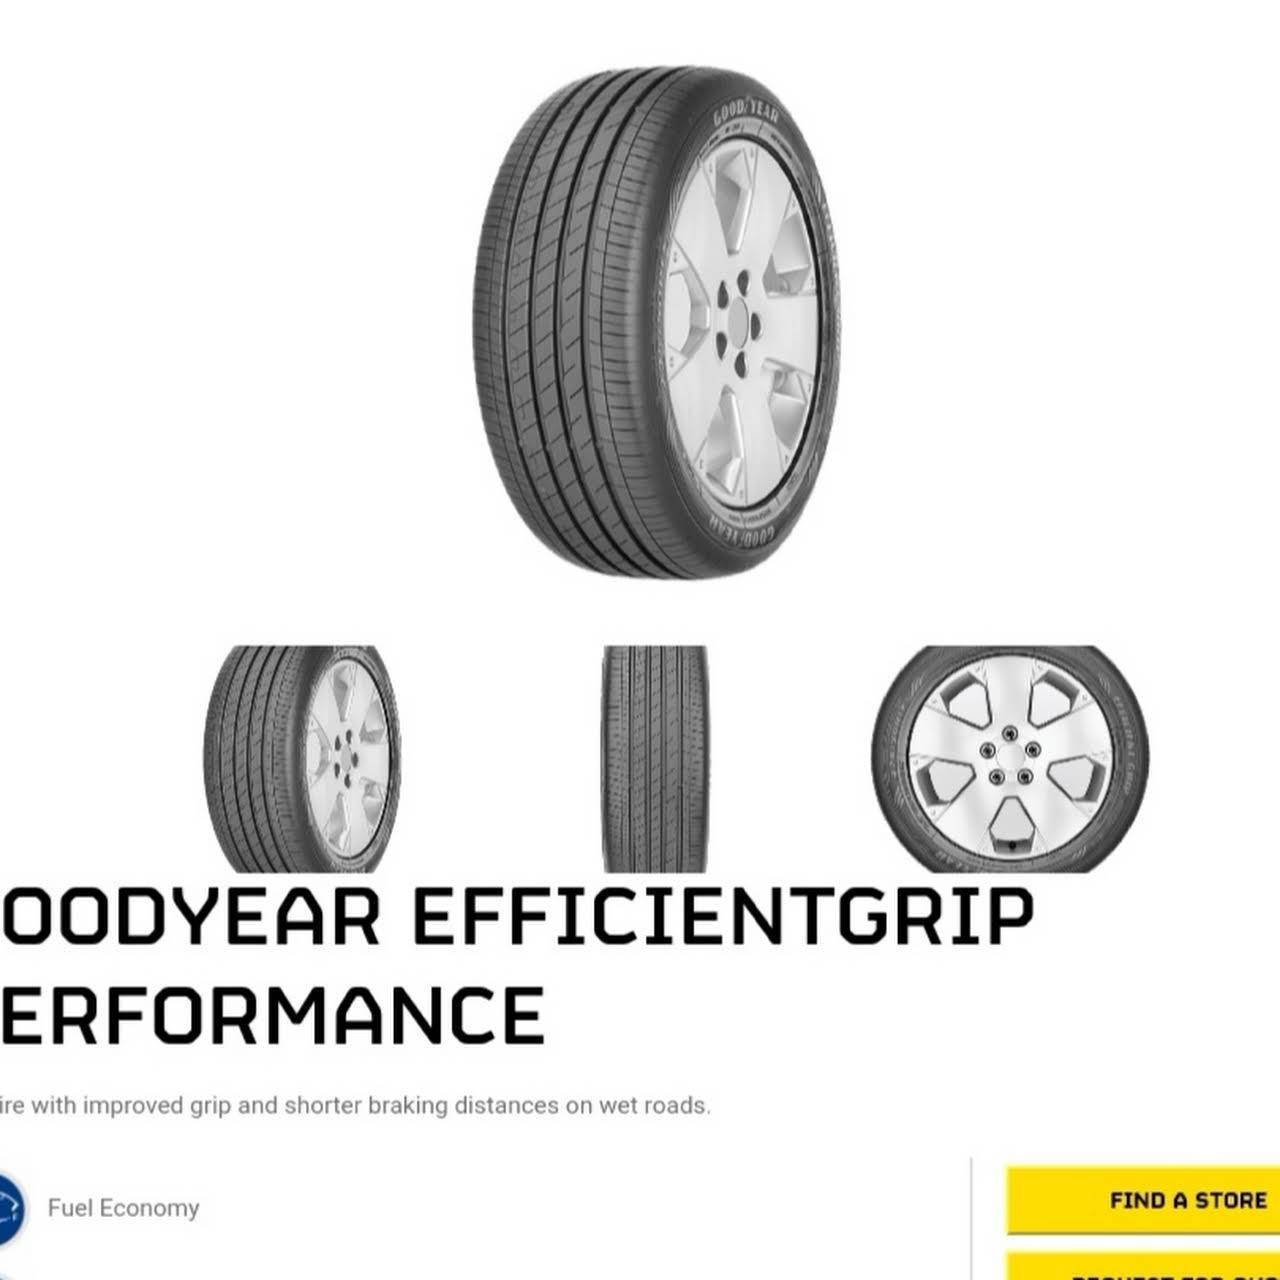 KB Maju Auto - Tire shop, services, breakdown, air-cond